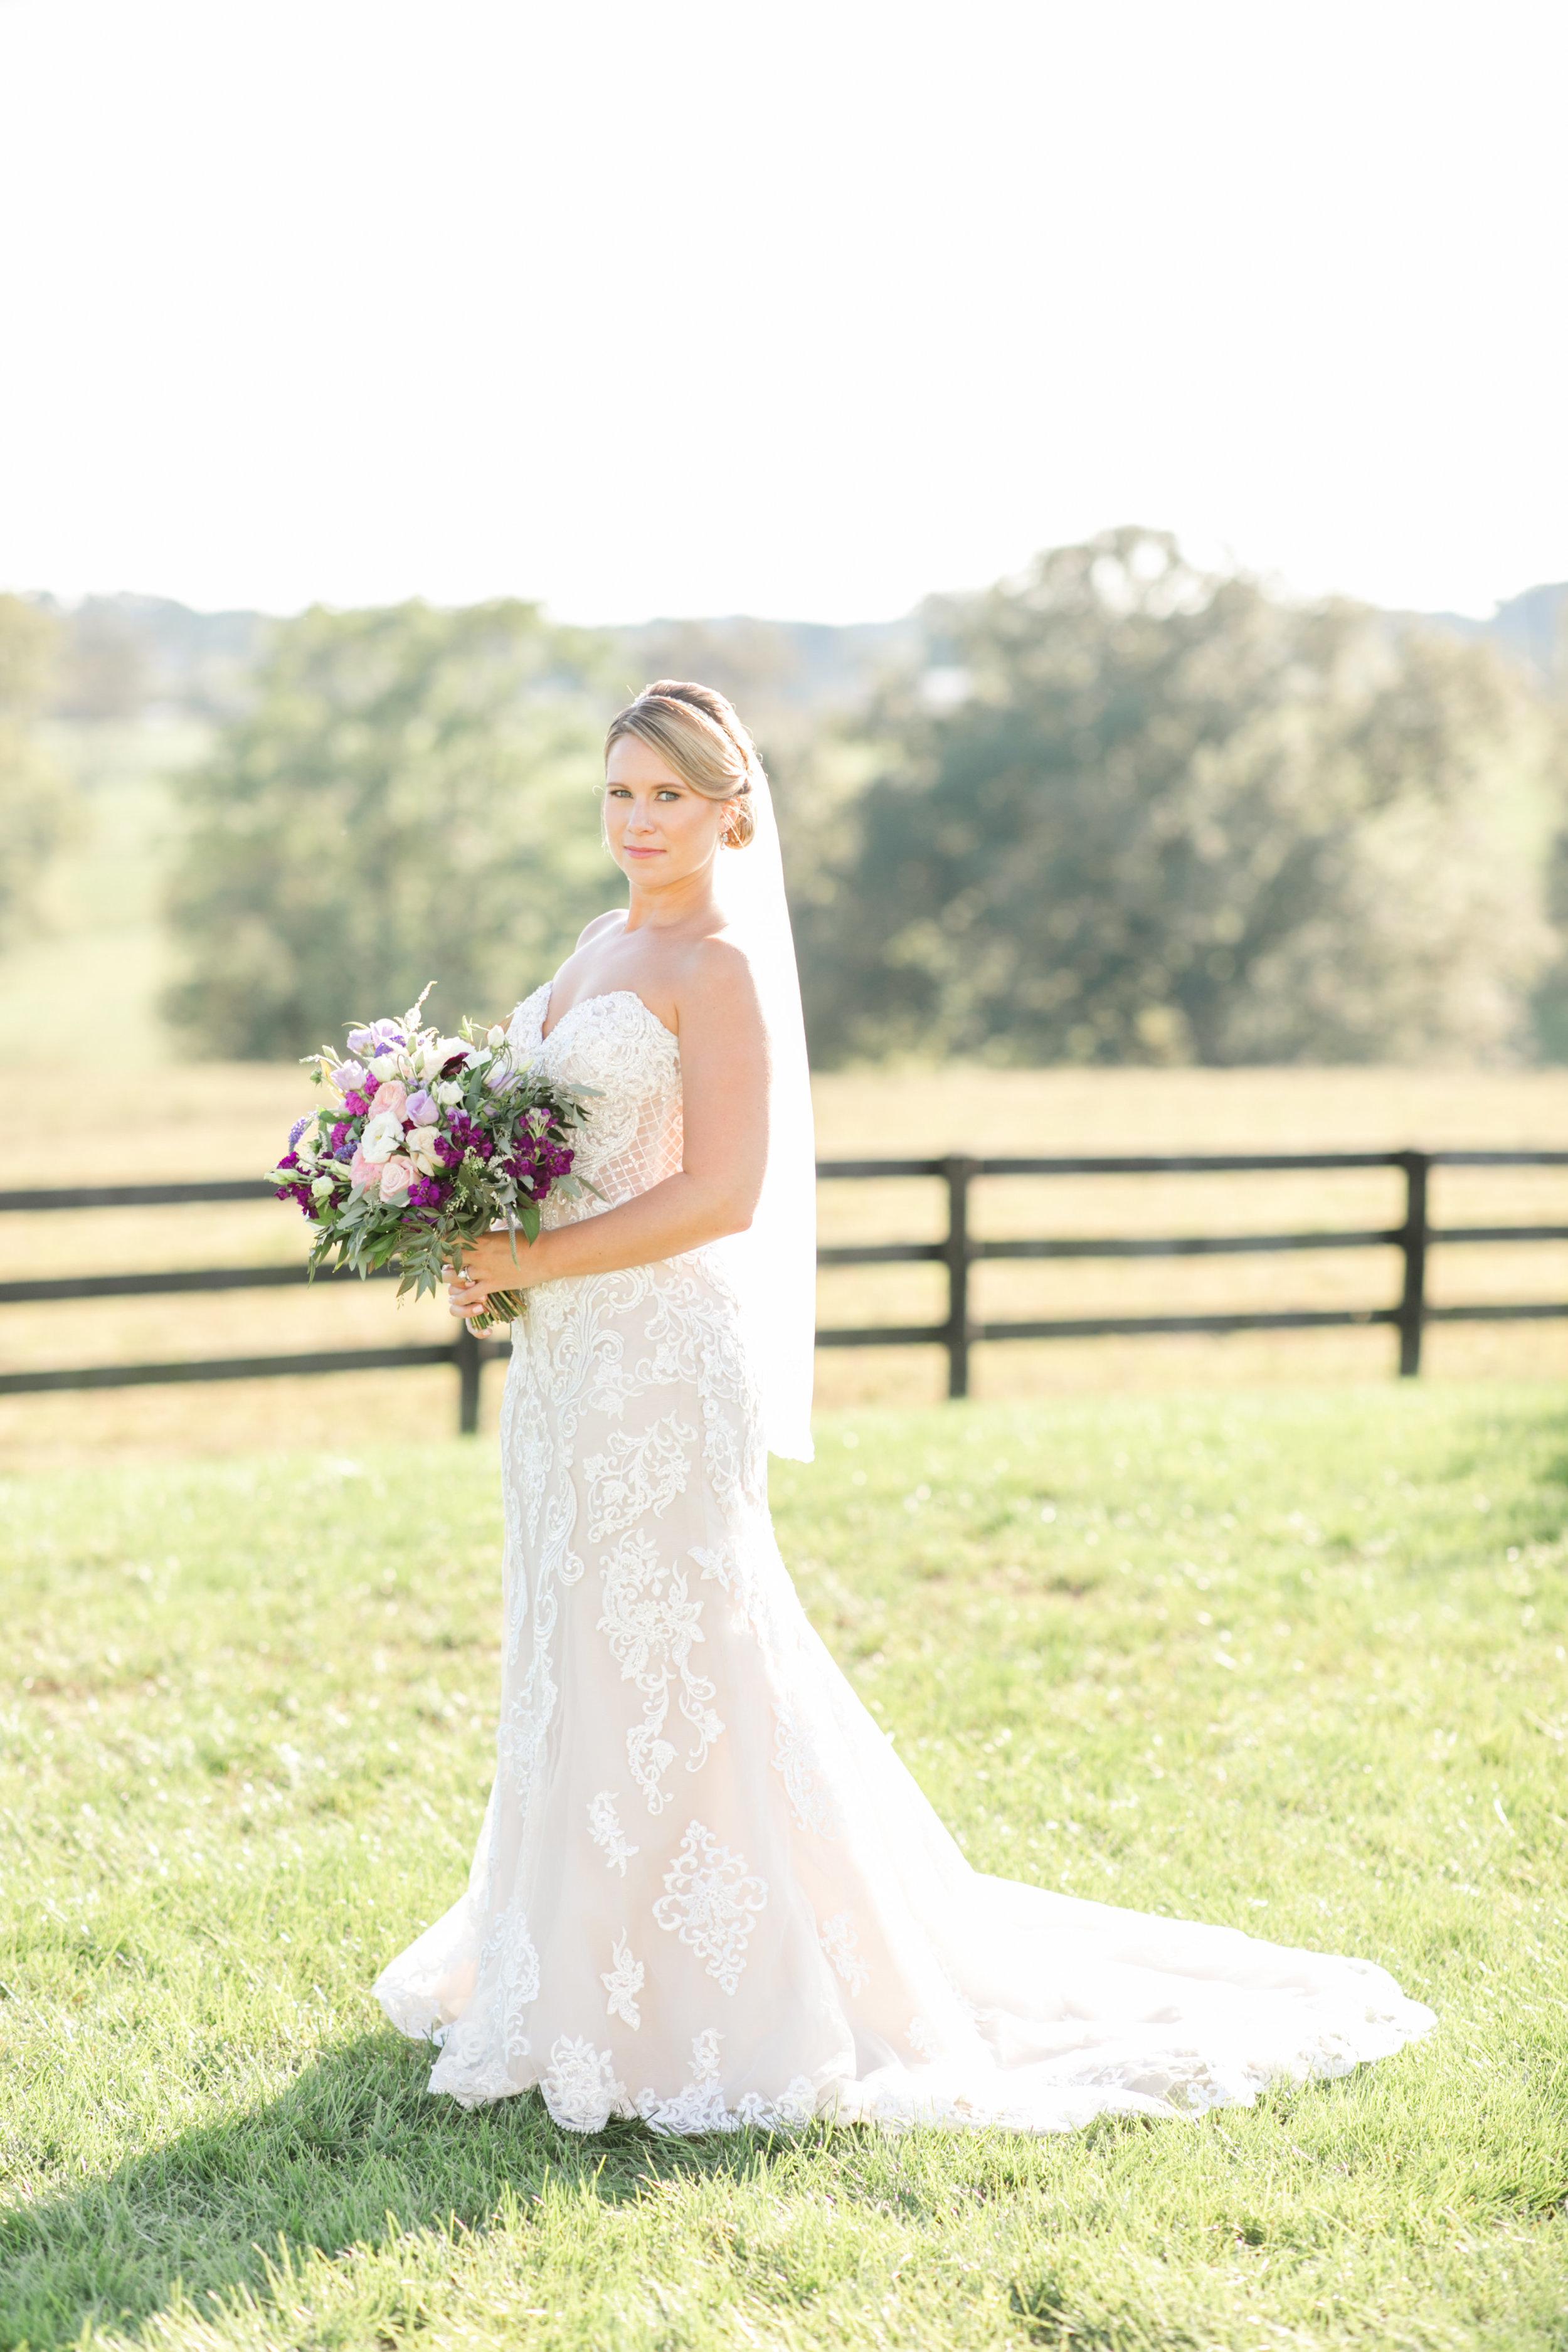 093018 VA Samantha Sihelnick + Russell - Megan Kelsey Photography LWi EP-0005.jpg